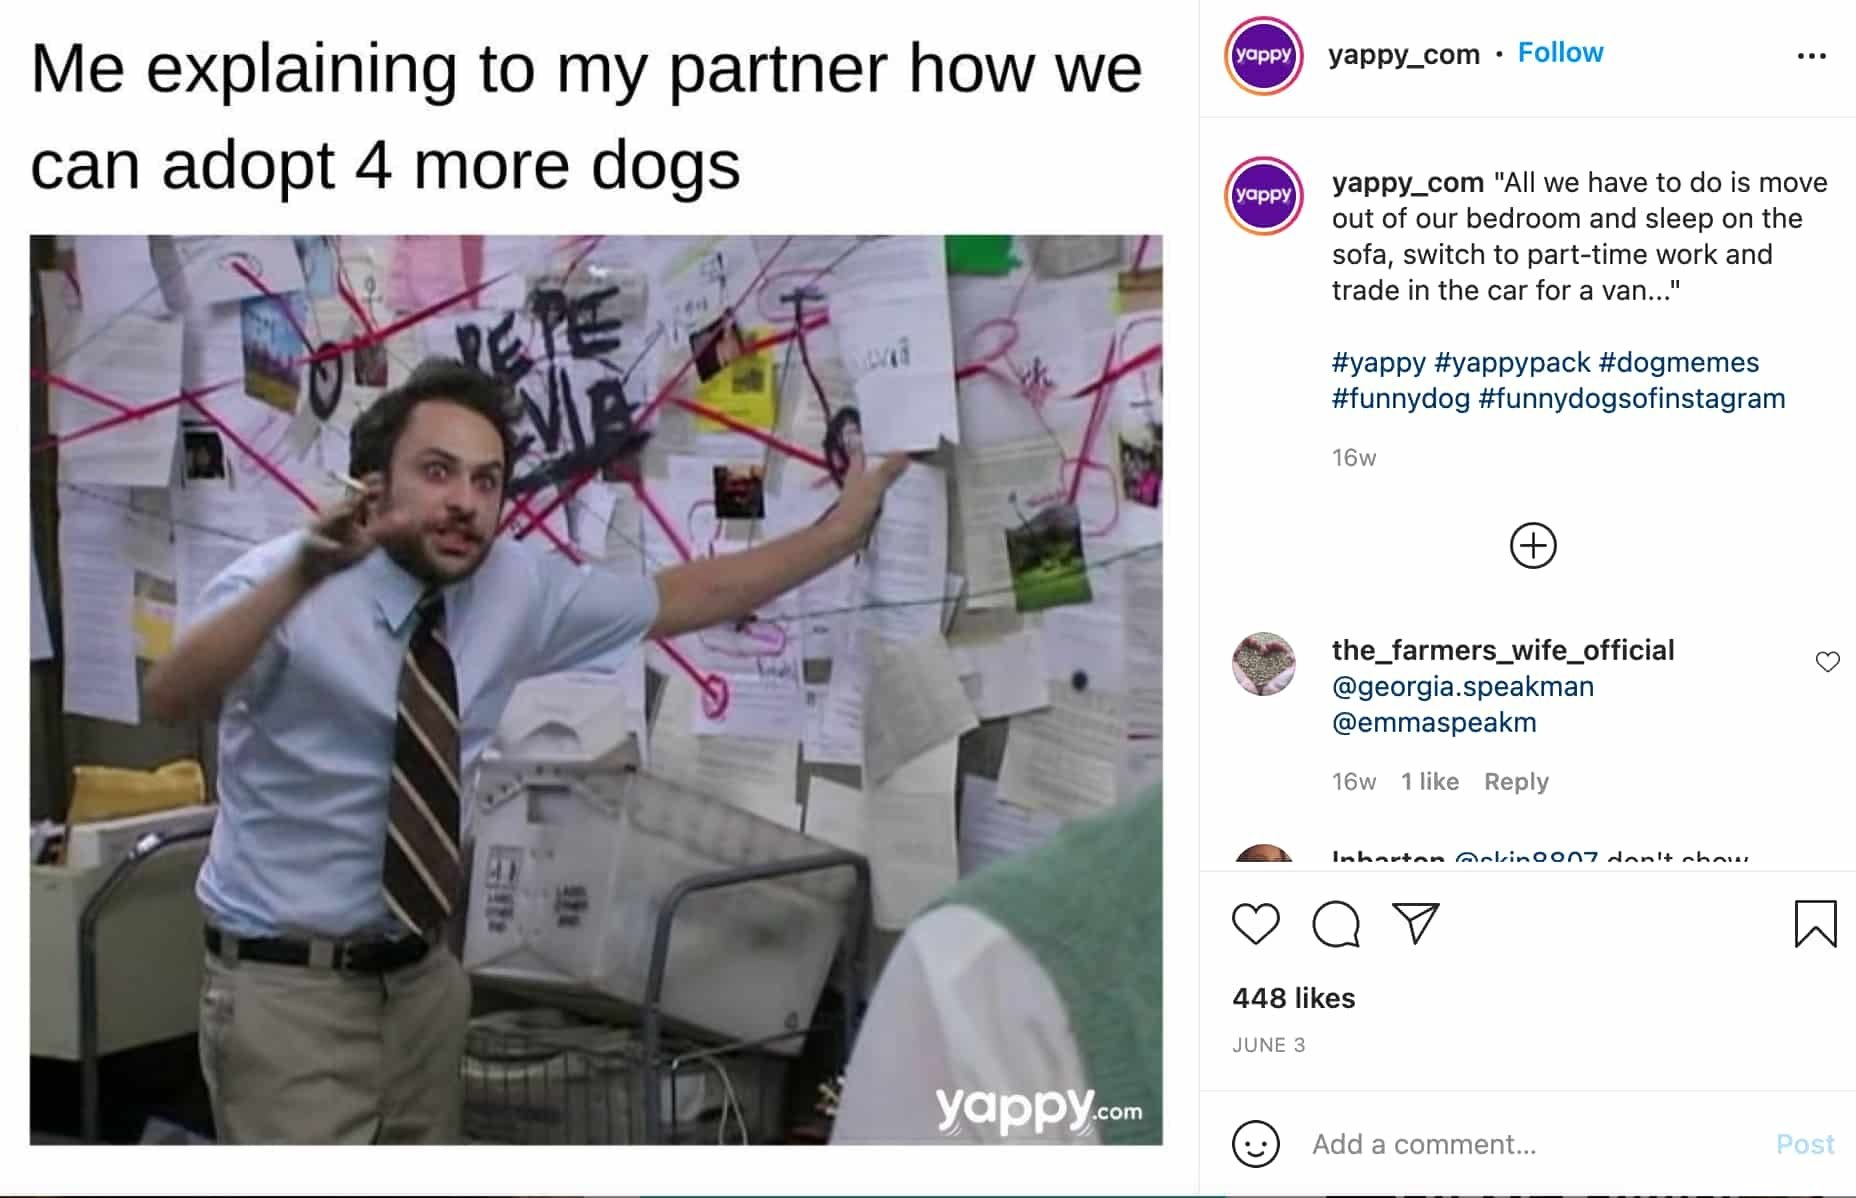 esempio di meme marketing di Yappy